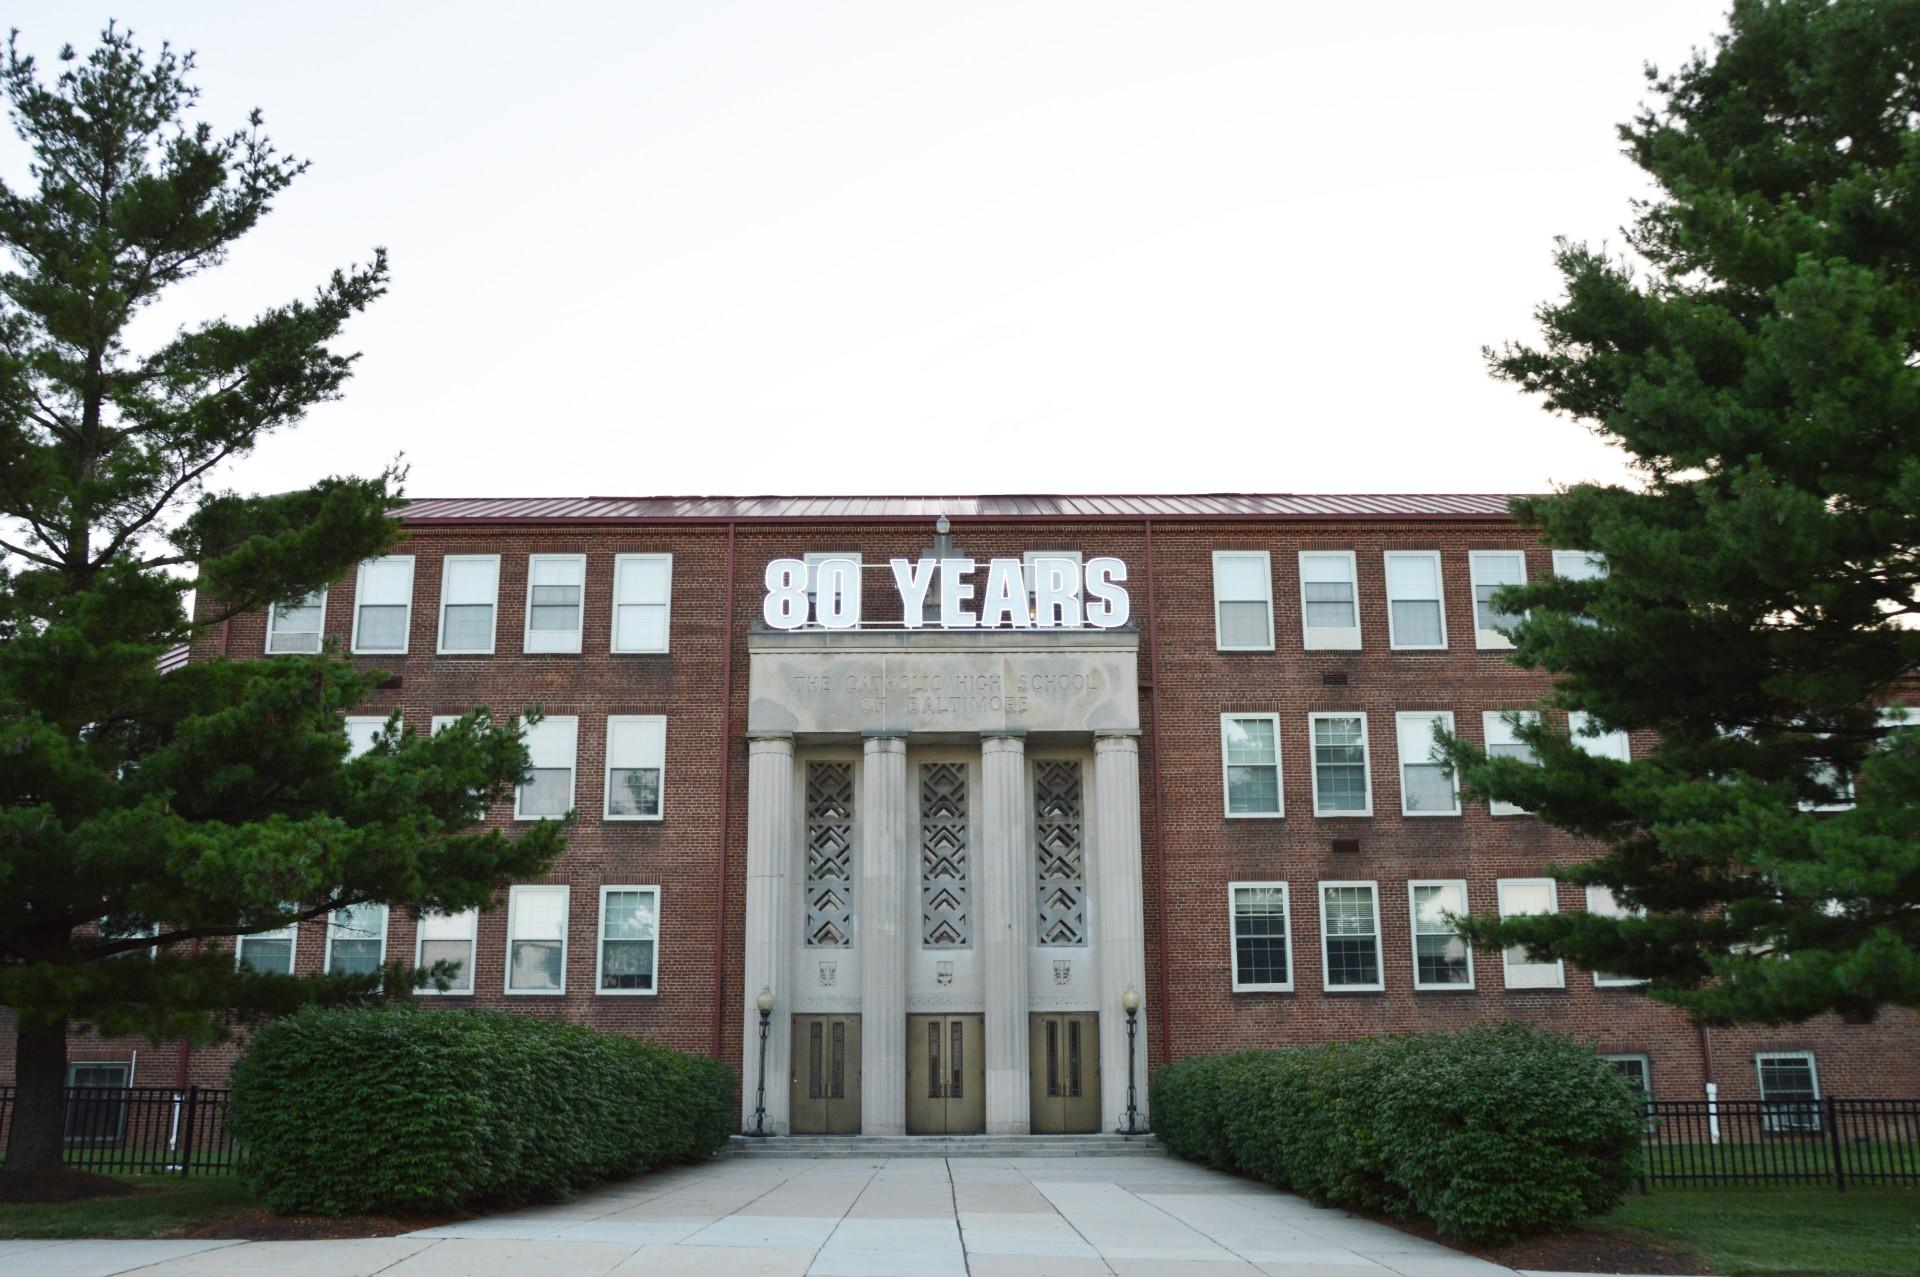 Exterior 80 Years.jpg